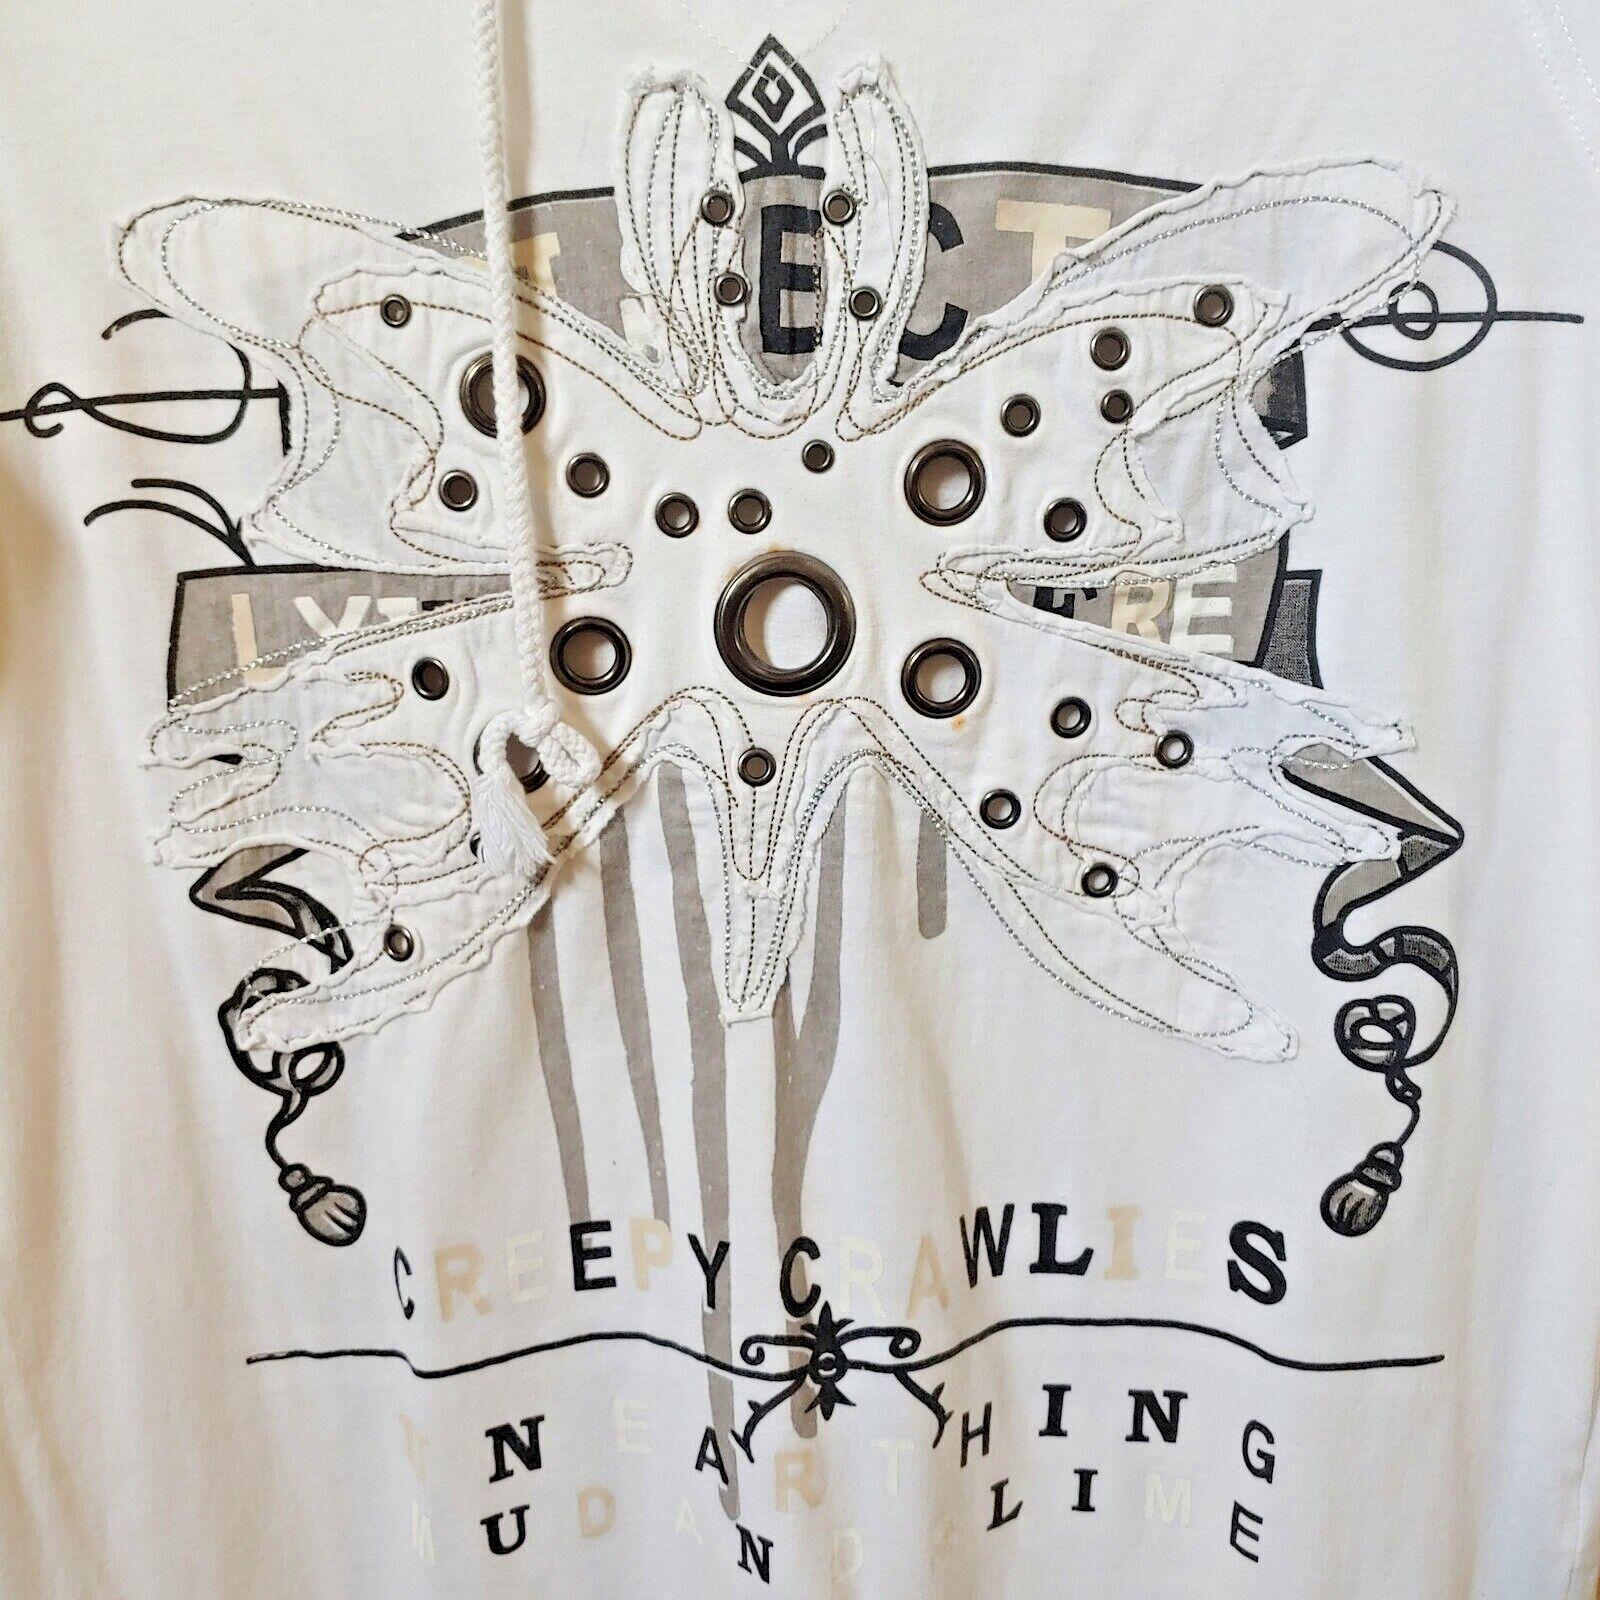 Energie | Mens Casual Short sleeve shirt - image 2